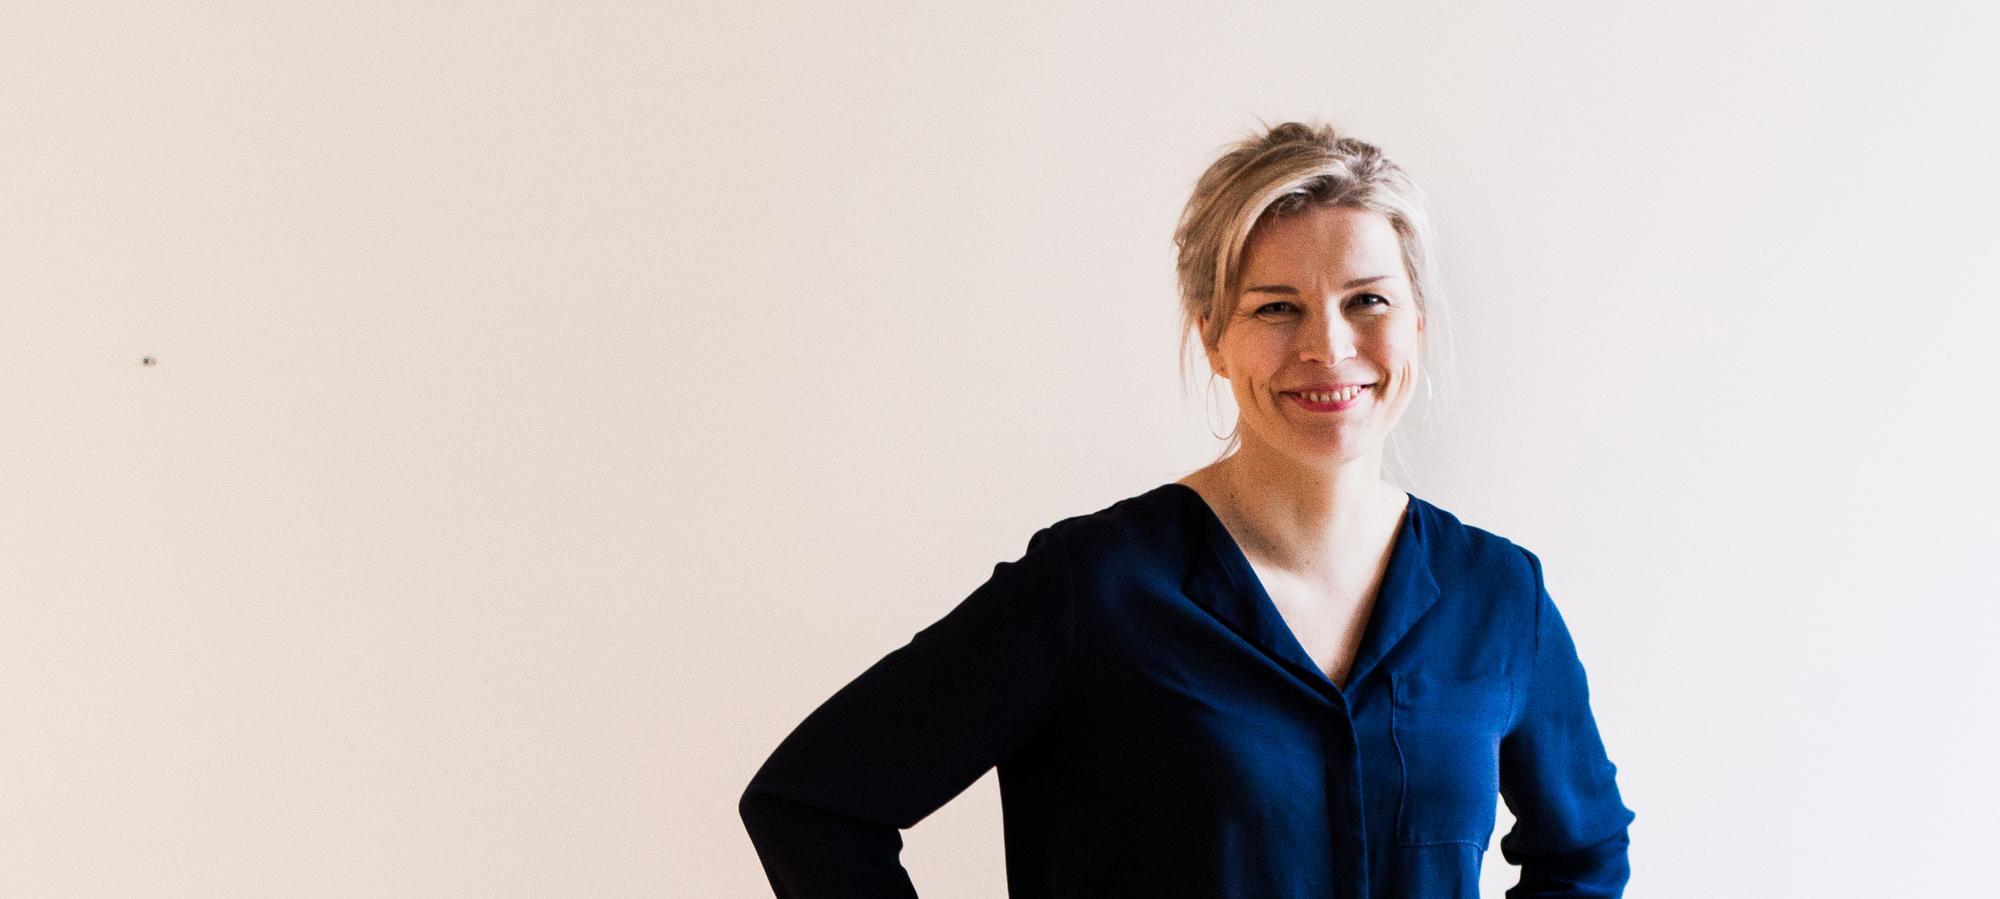 Sofia Amberla kuva Aurora Salonen